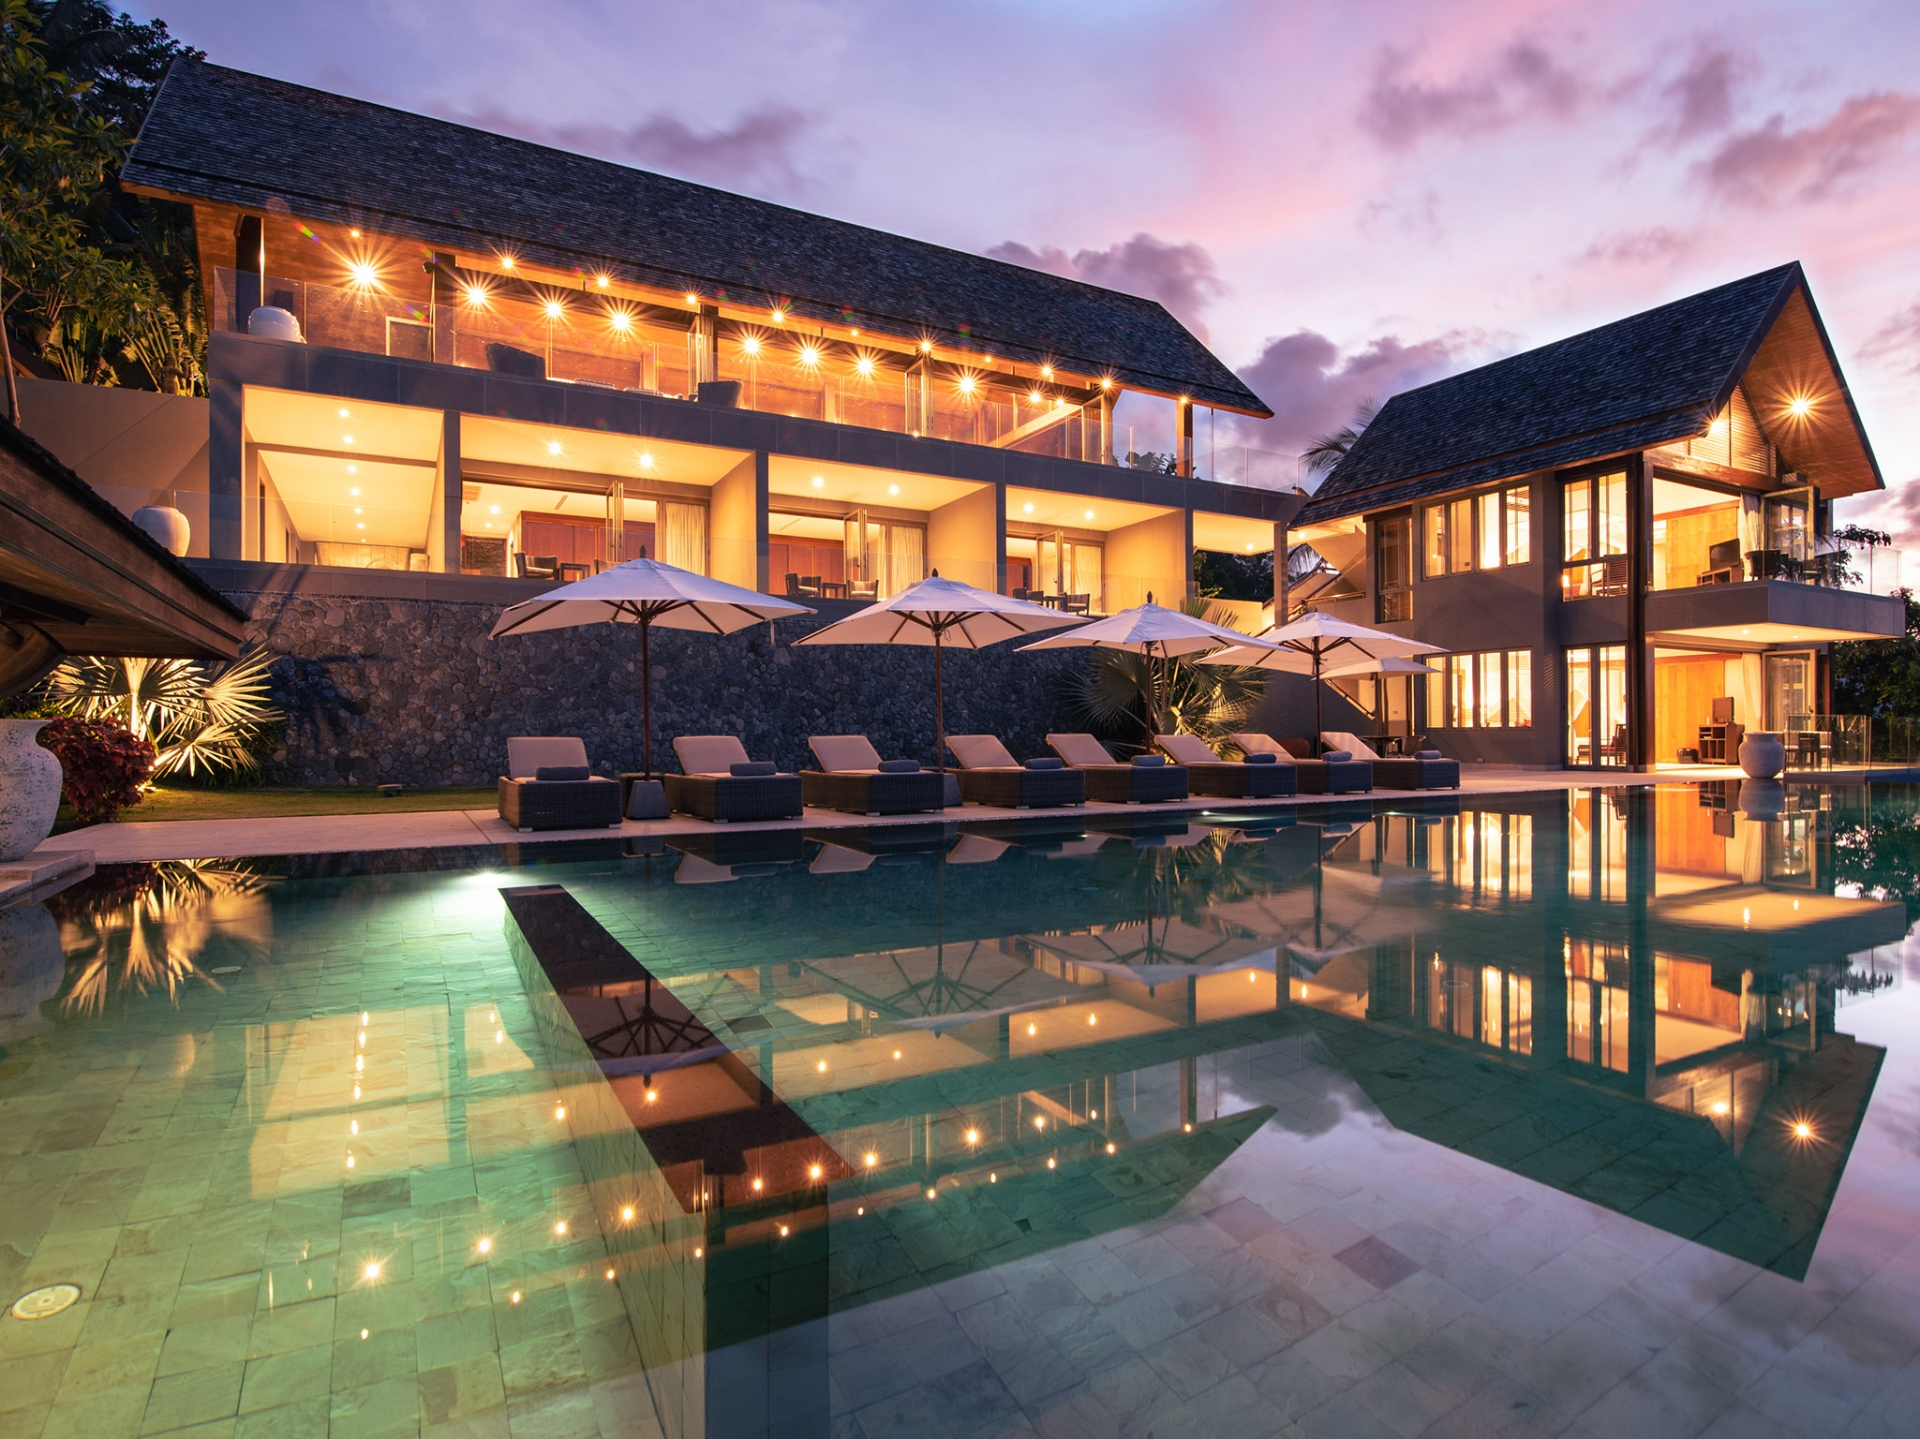 Breathtaking Family Villa-030 Villa Suralai - Villa pool and exterior at sunset.jpg